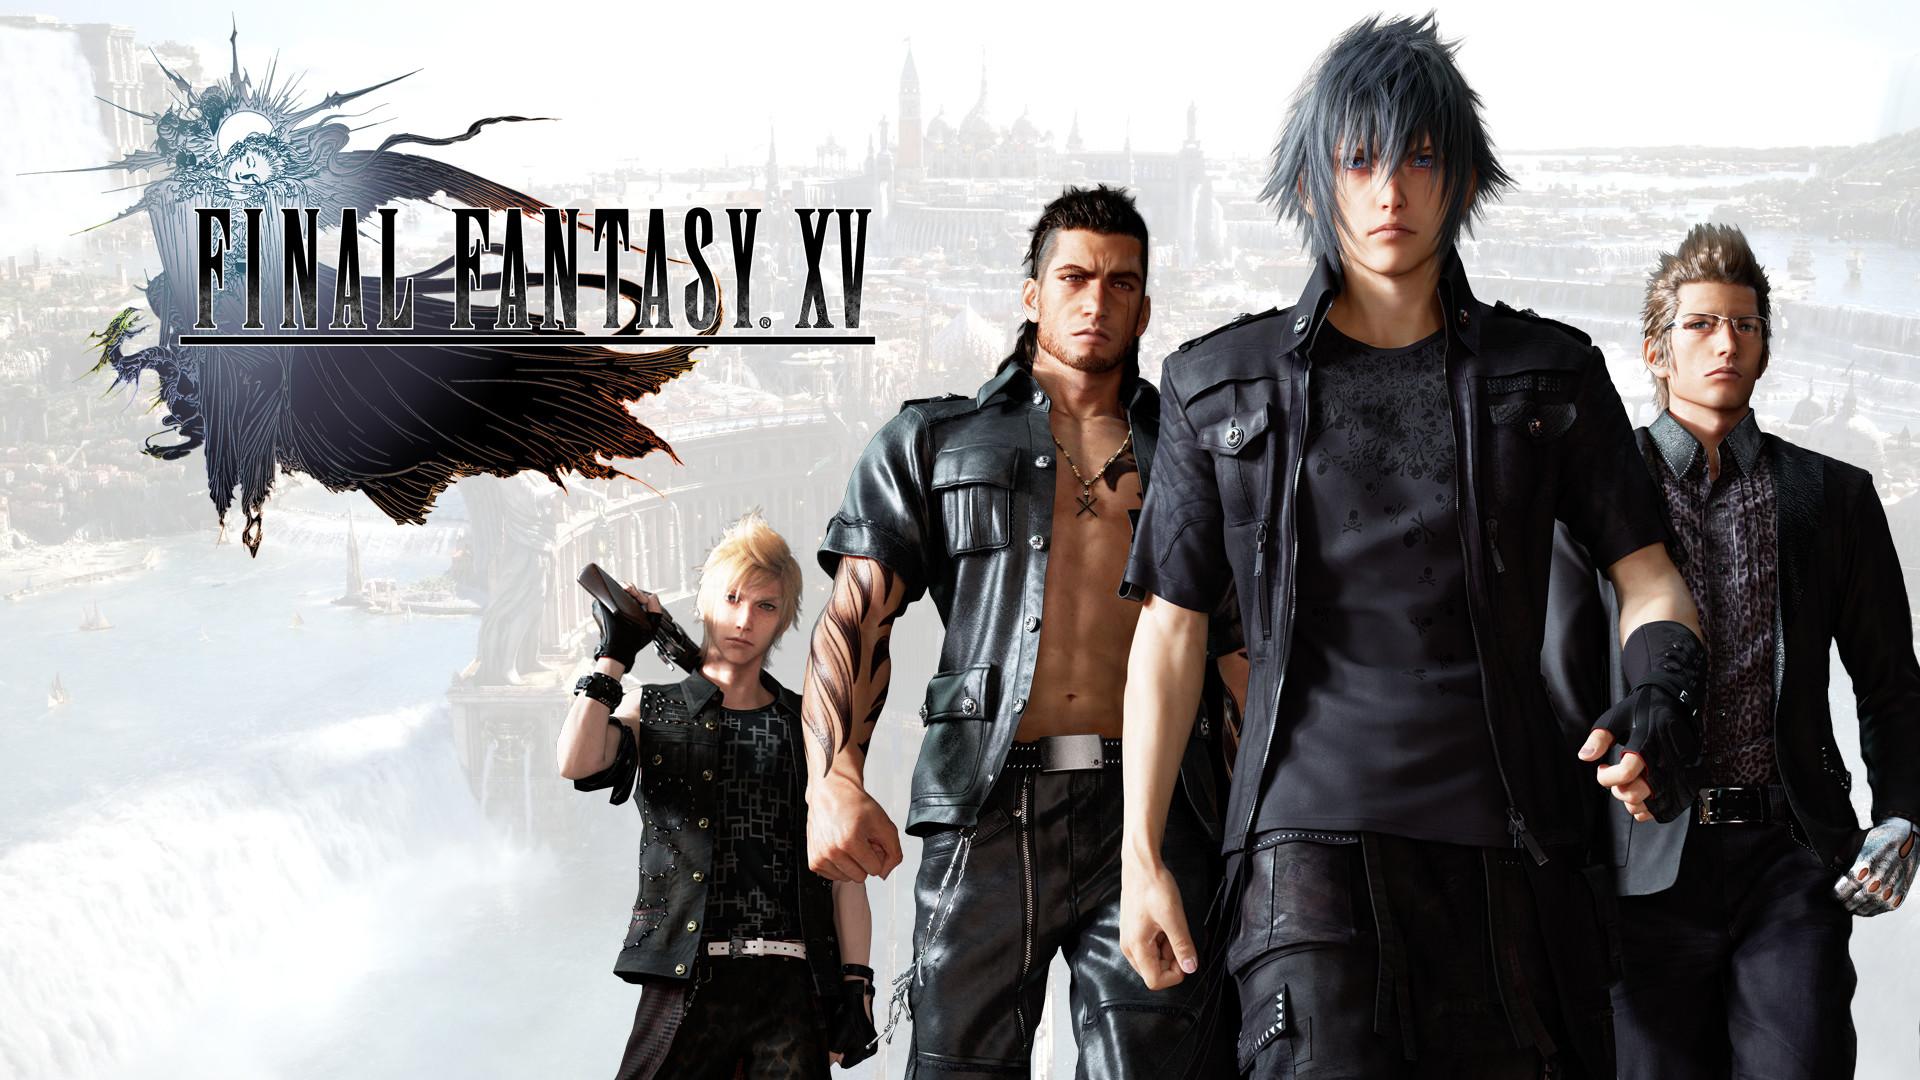 … Final Fantasy XV wallpaper, whit new prompto by REALzeles